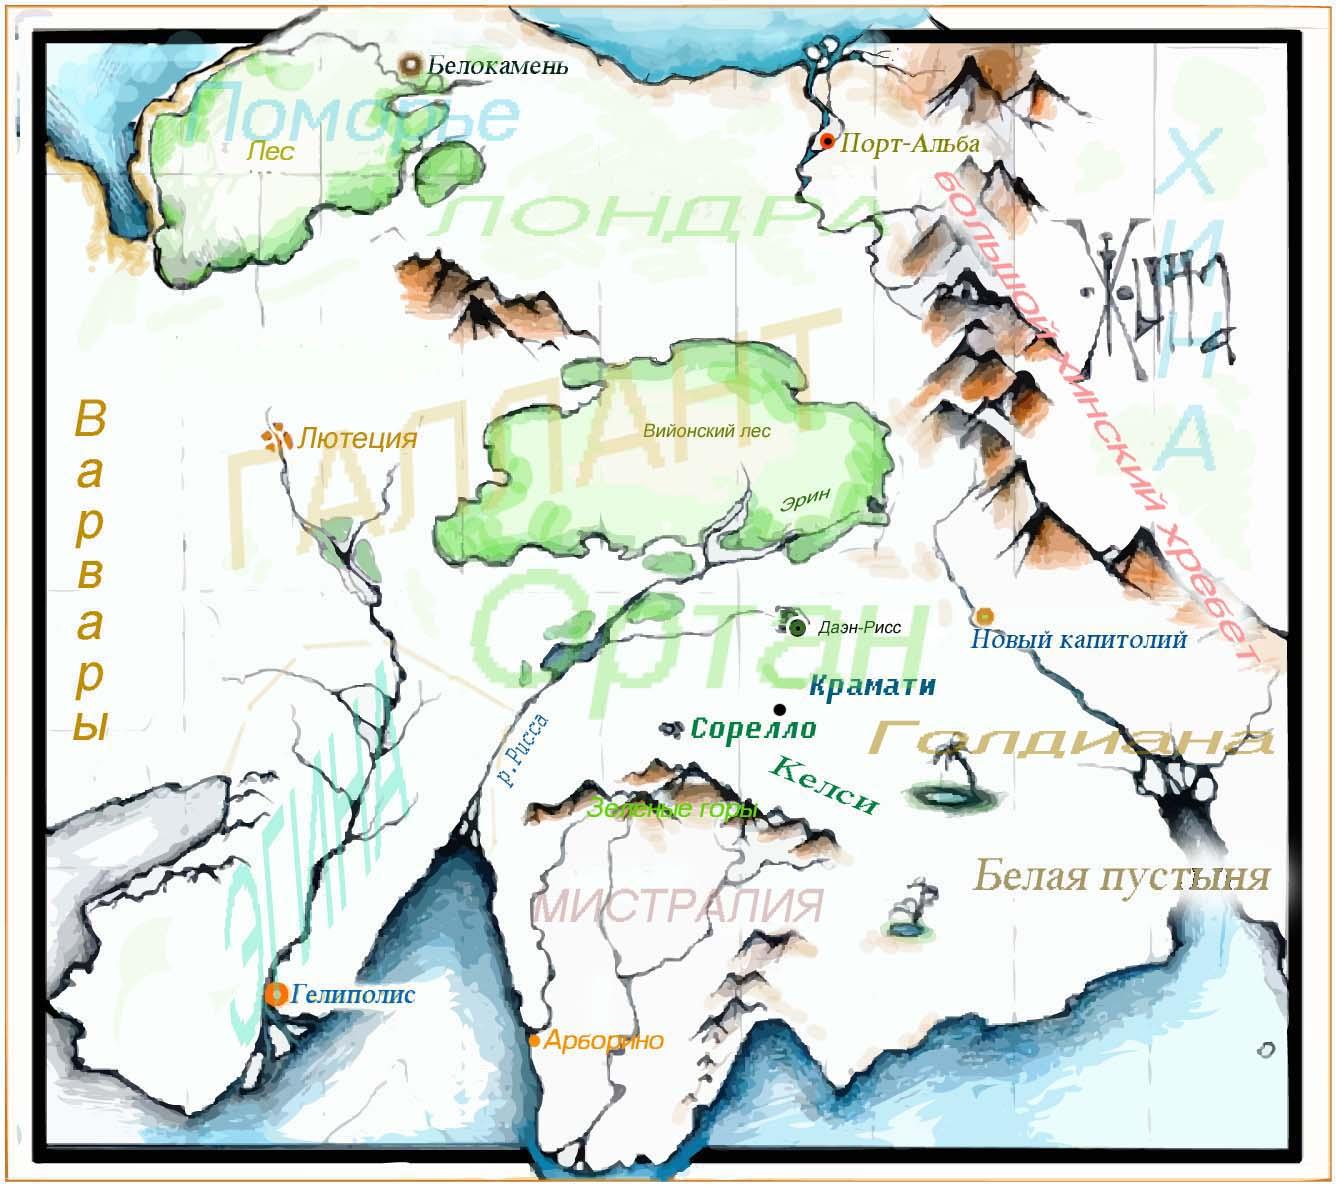 http://pankeewa.org.ru/pics/map.jpg